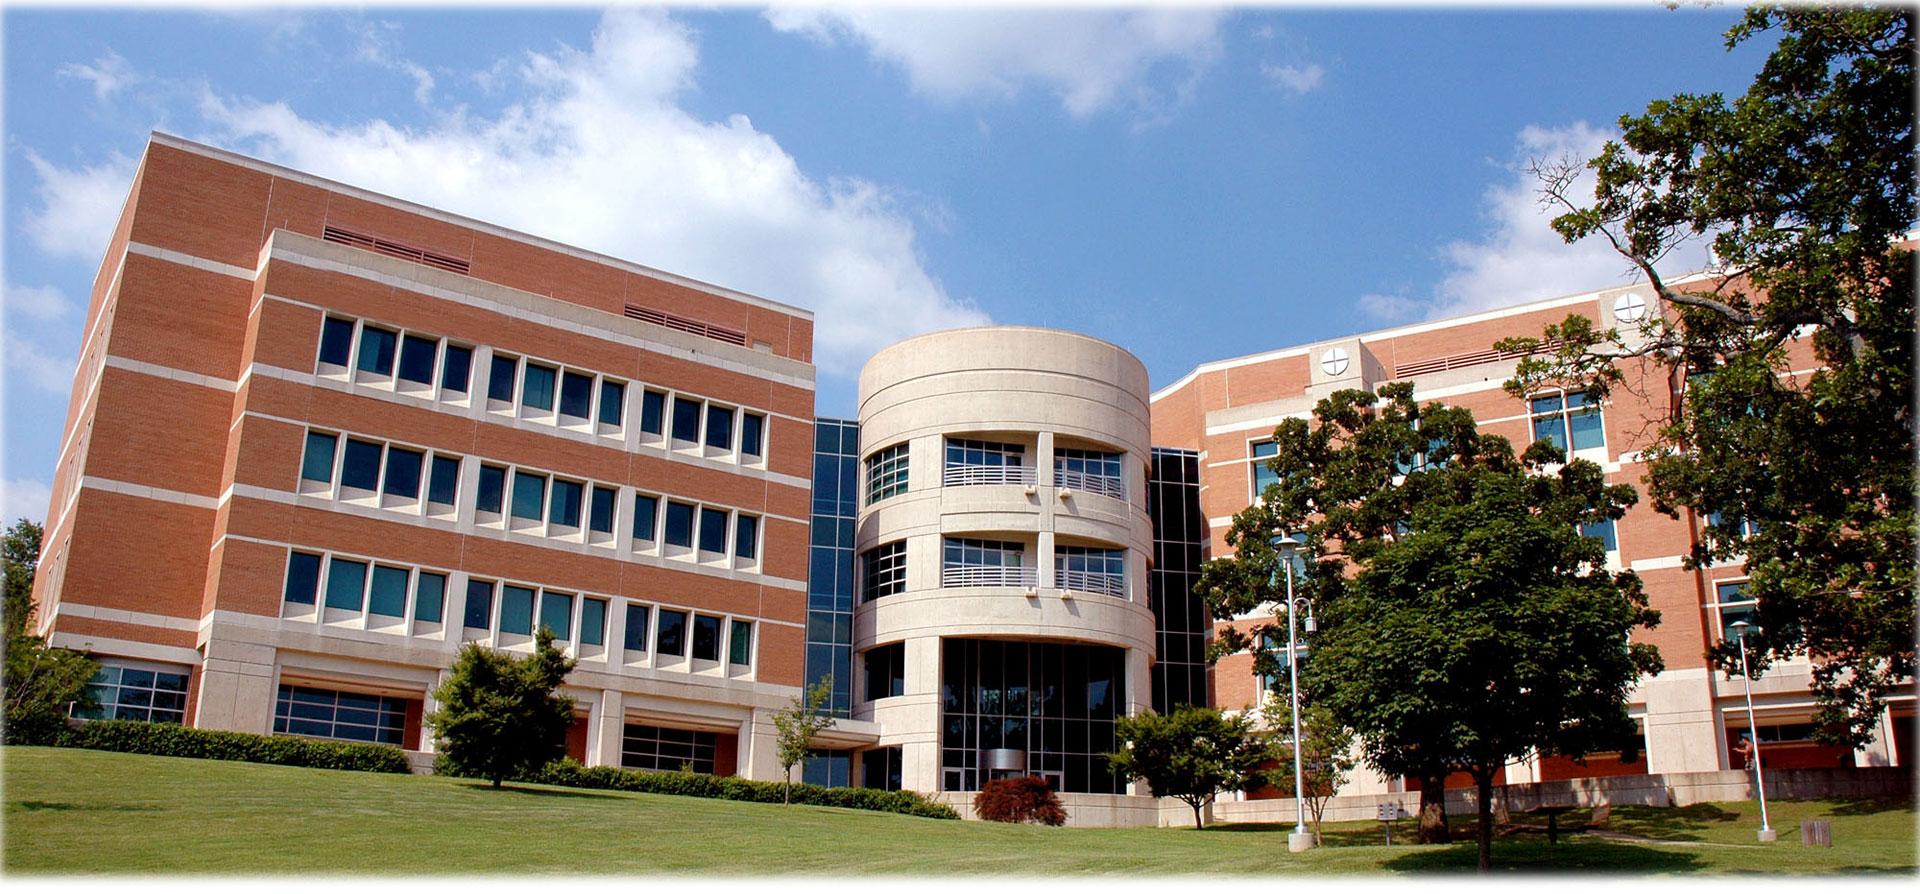 Sekolah Tinggi Ilmu Ekonomi Pelita Bangsa